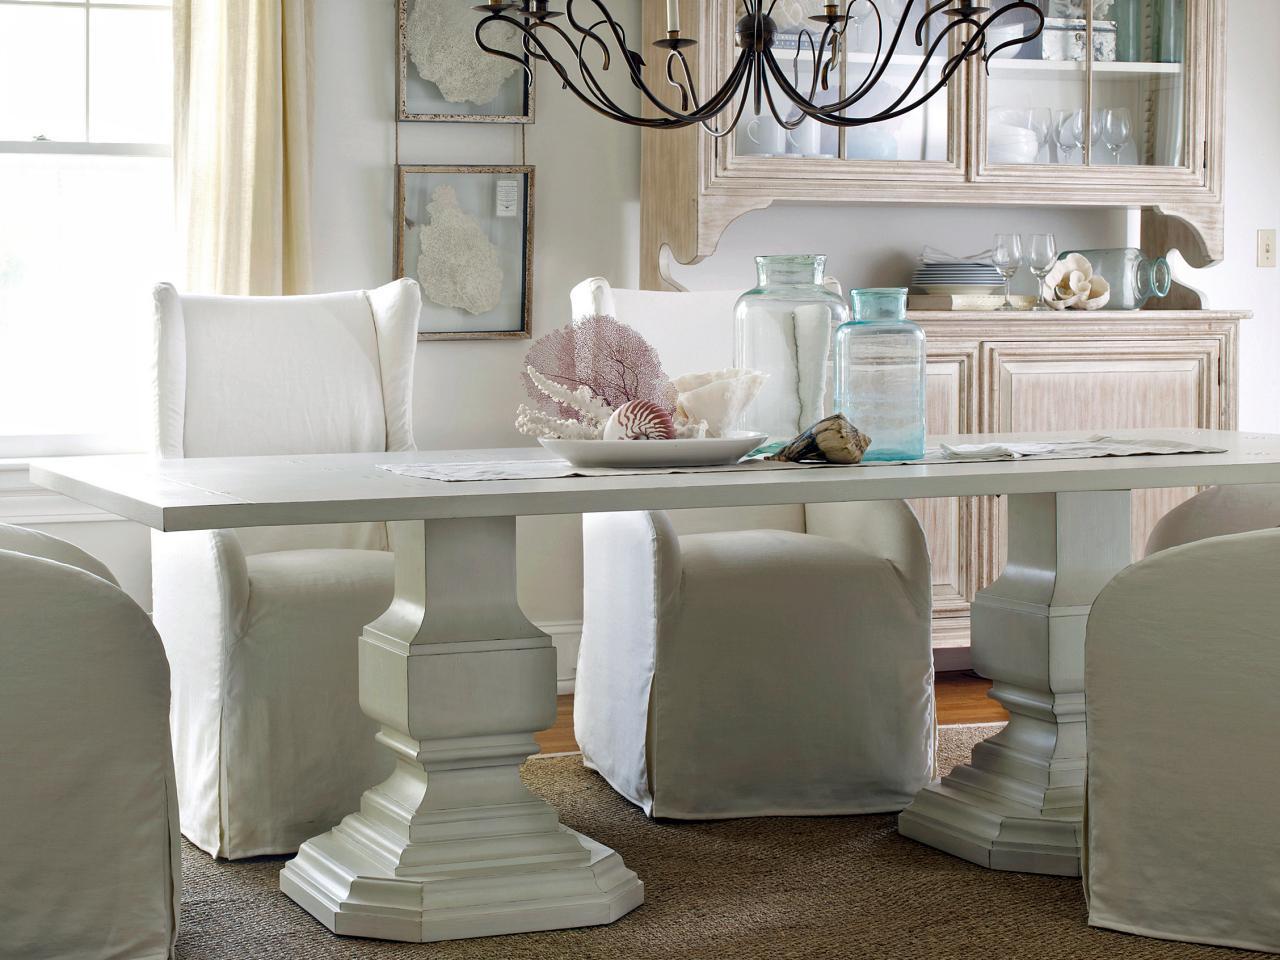 CI-Somerset-Bay_beach-style-dining-room_s4x3.jpg.rend.hgtvcom.1280.960